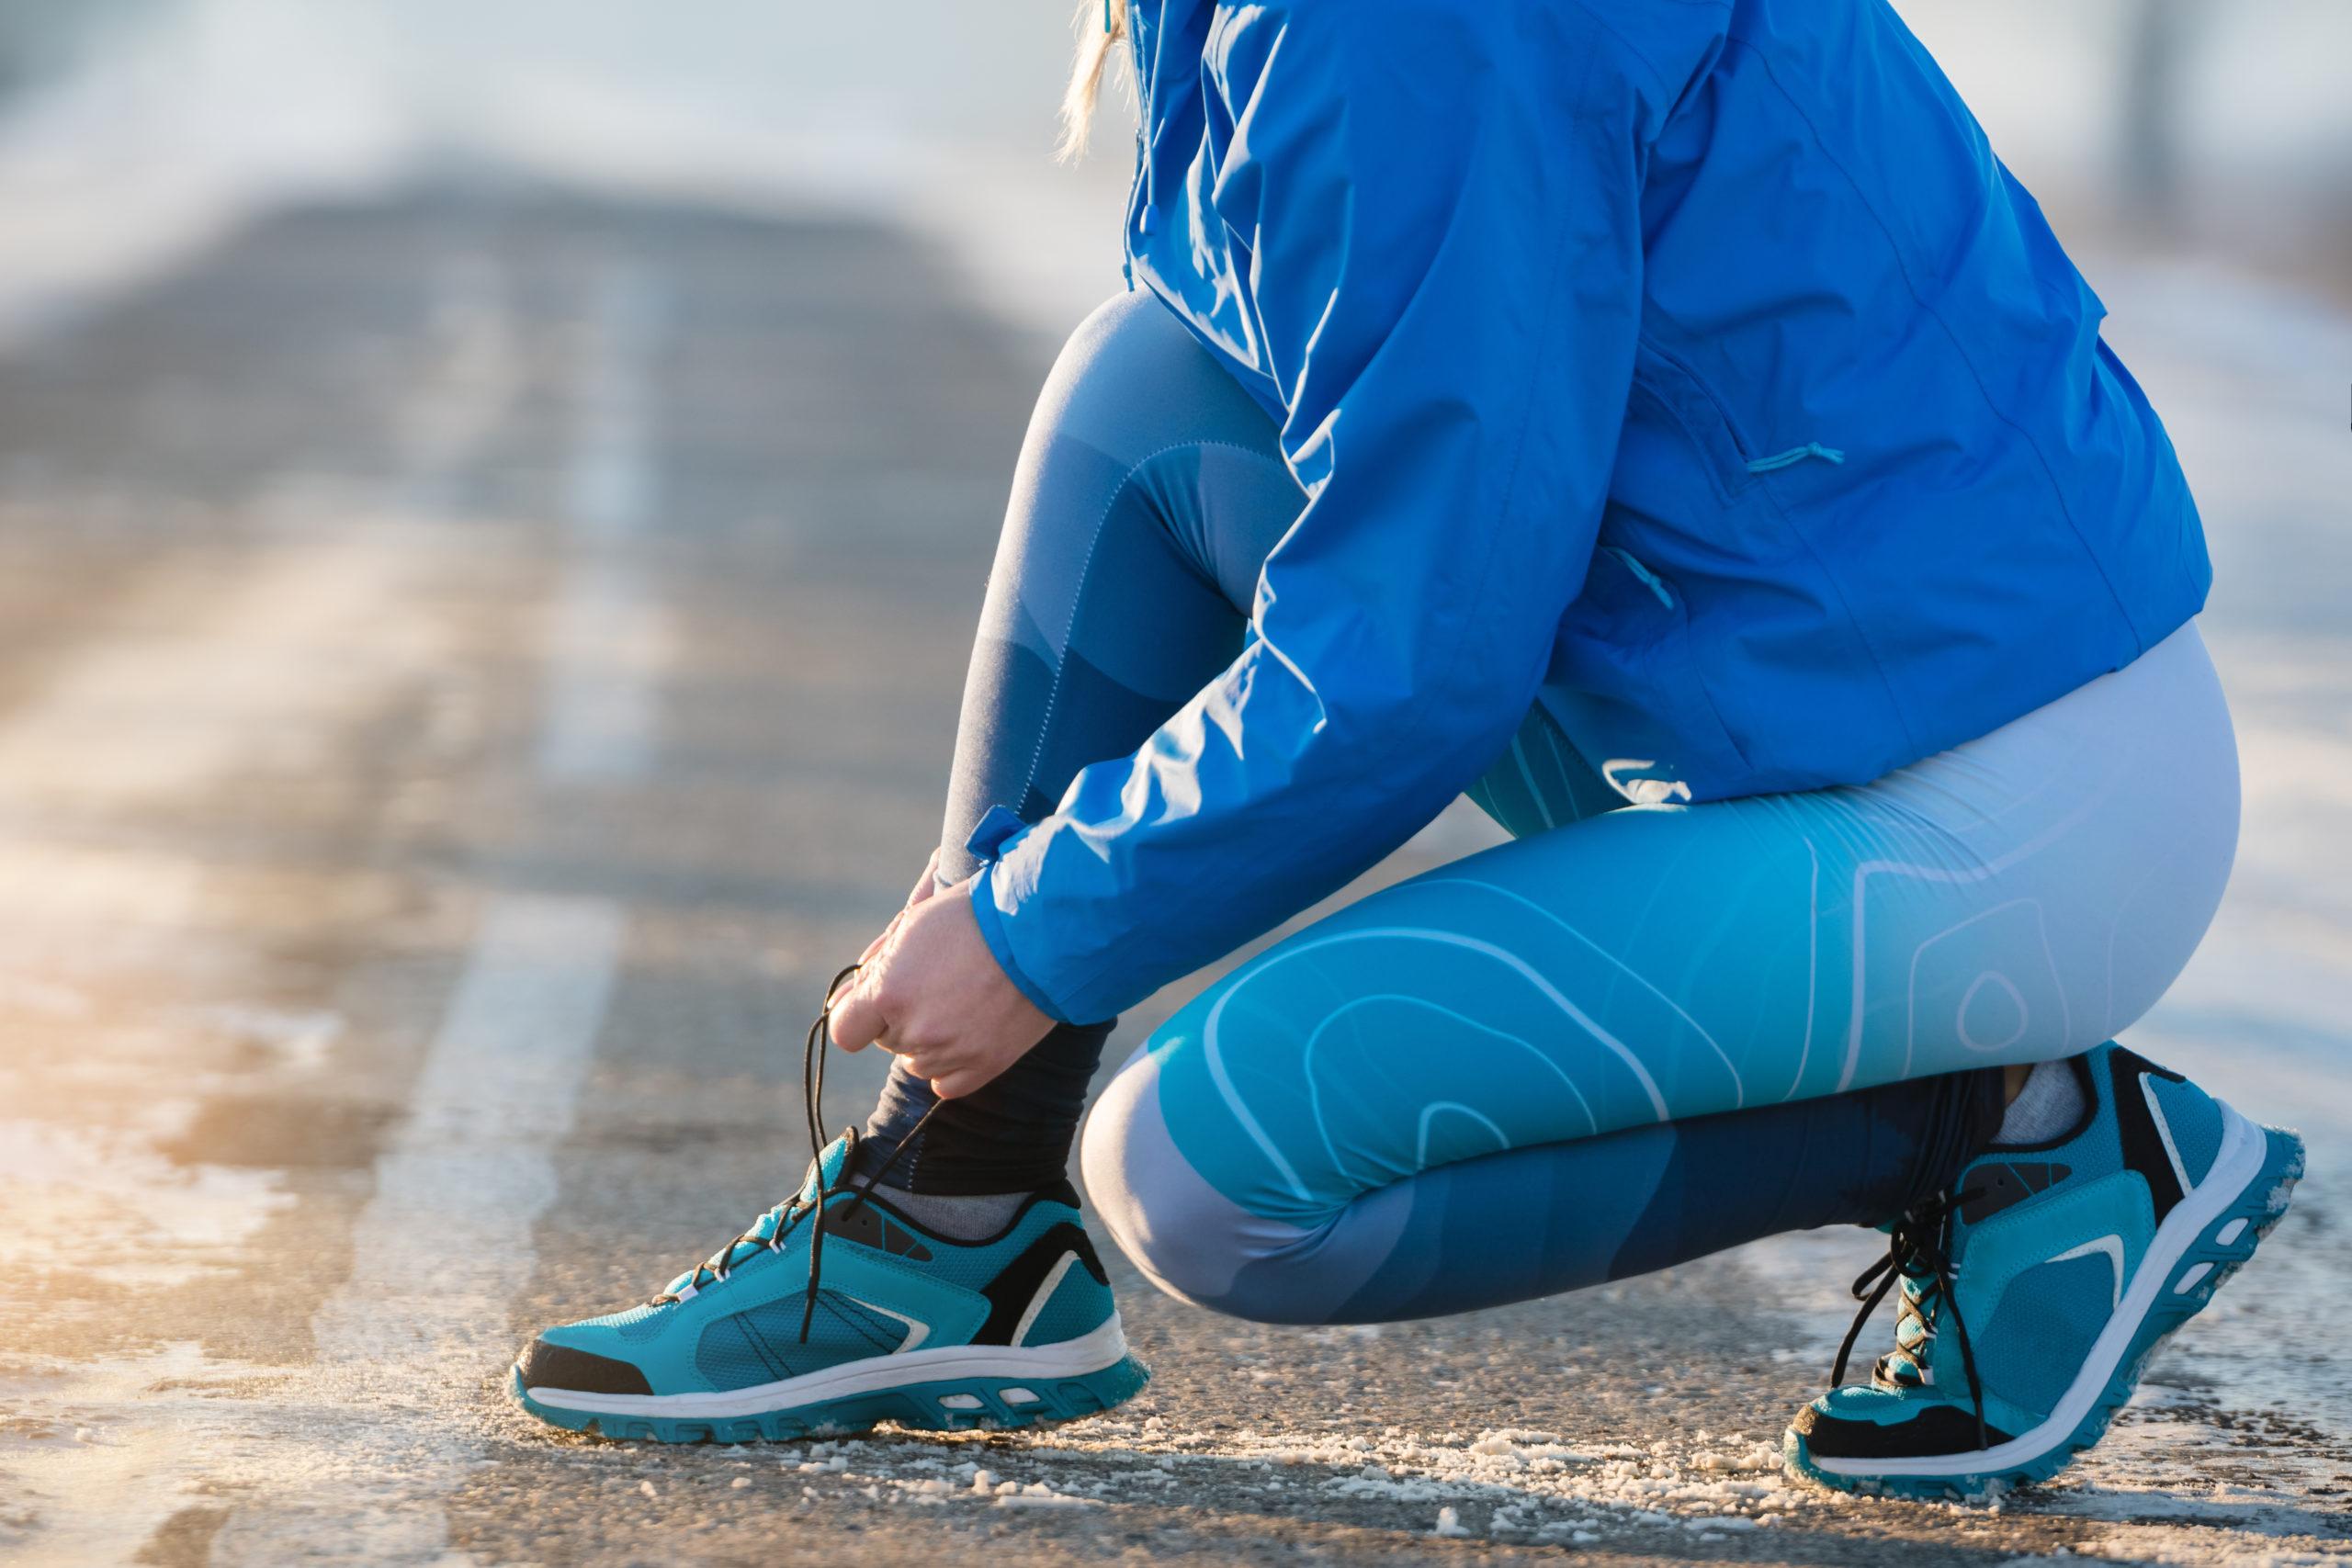 Woman runner tying shoelaces. Healthy lifestyle © PAstudio - stock.adobe.com